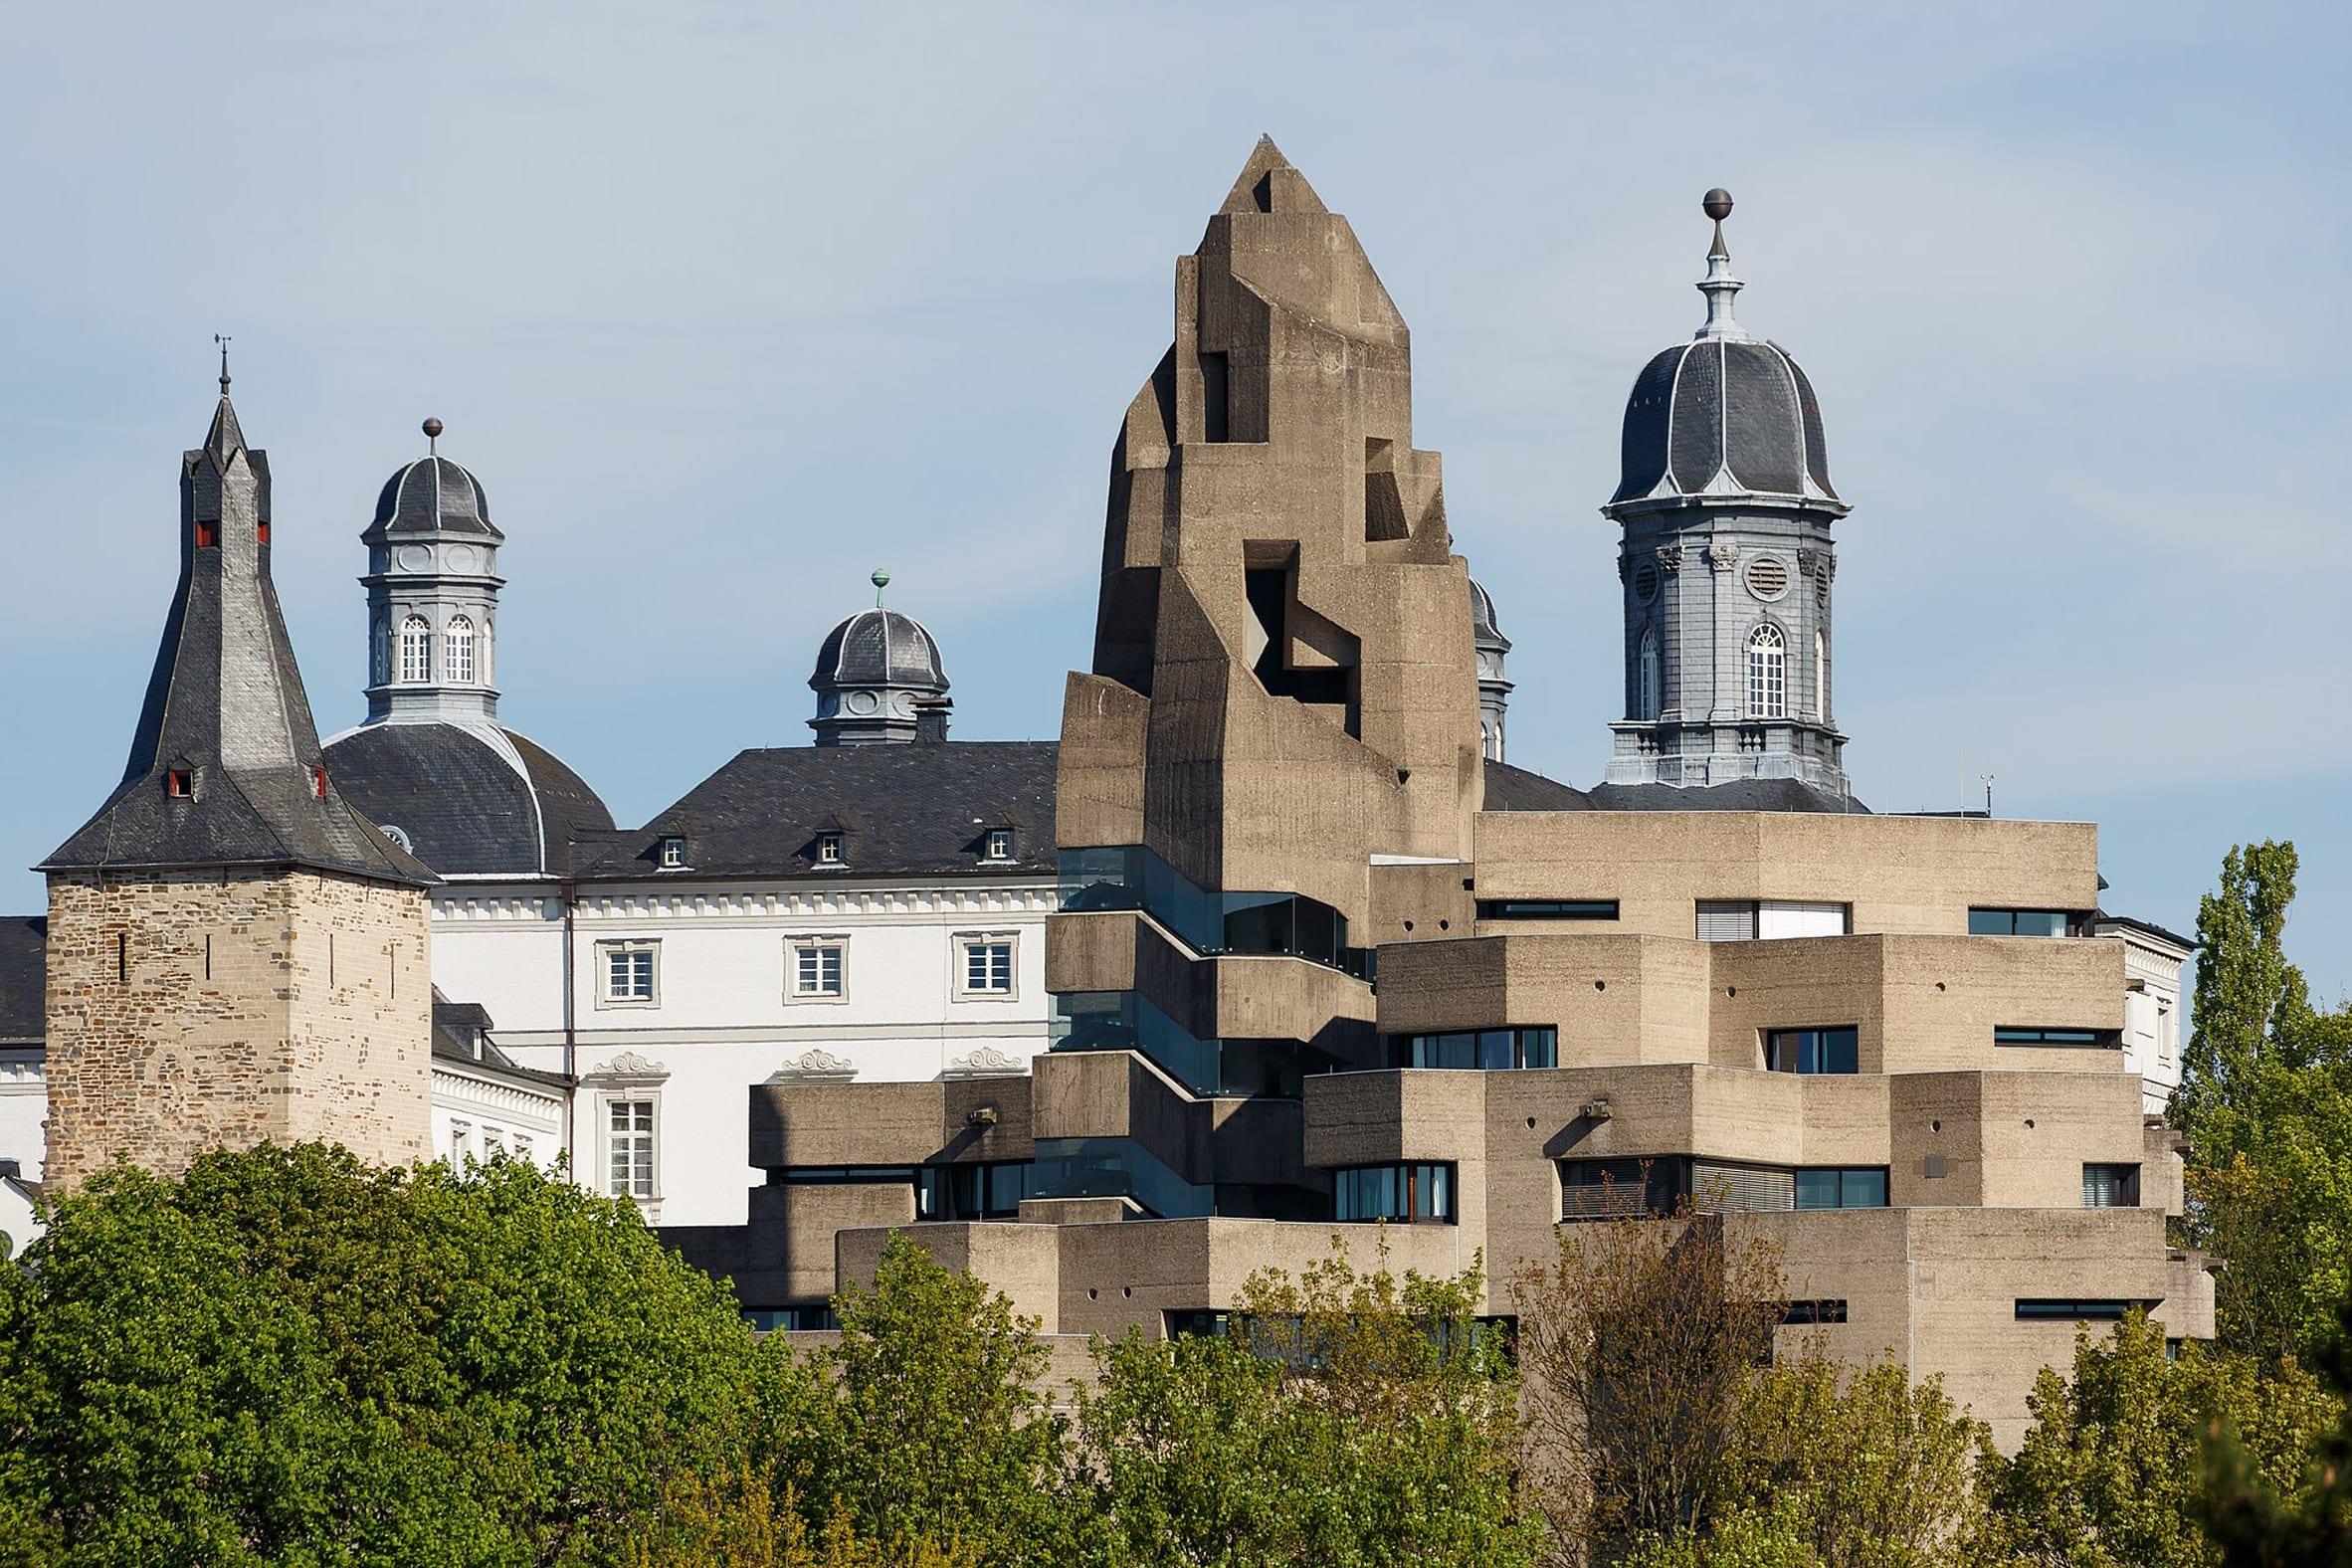 Brutalist Bensberger City Hall by Gottfried Böhm